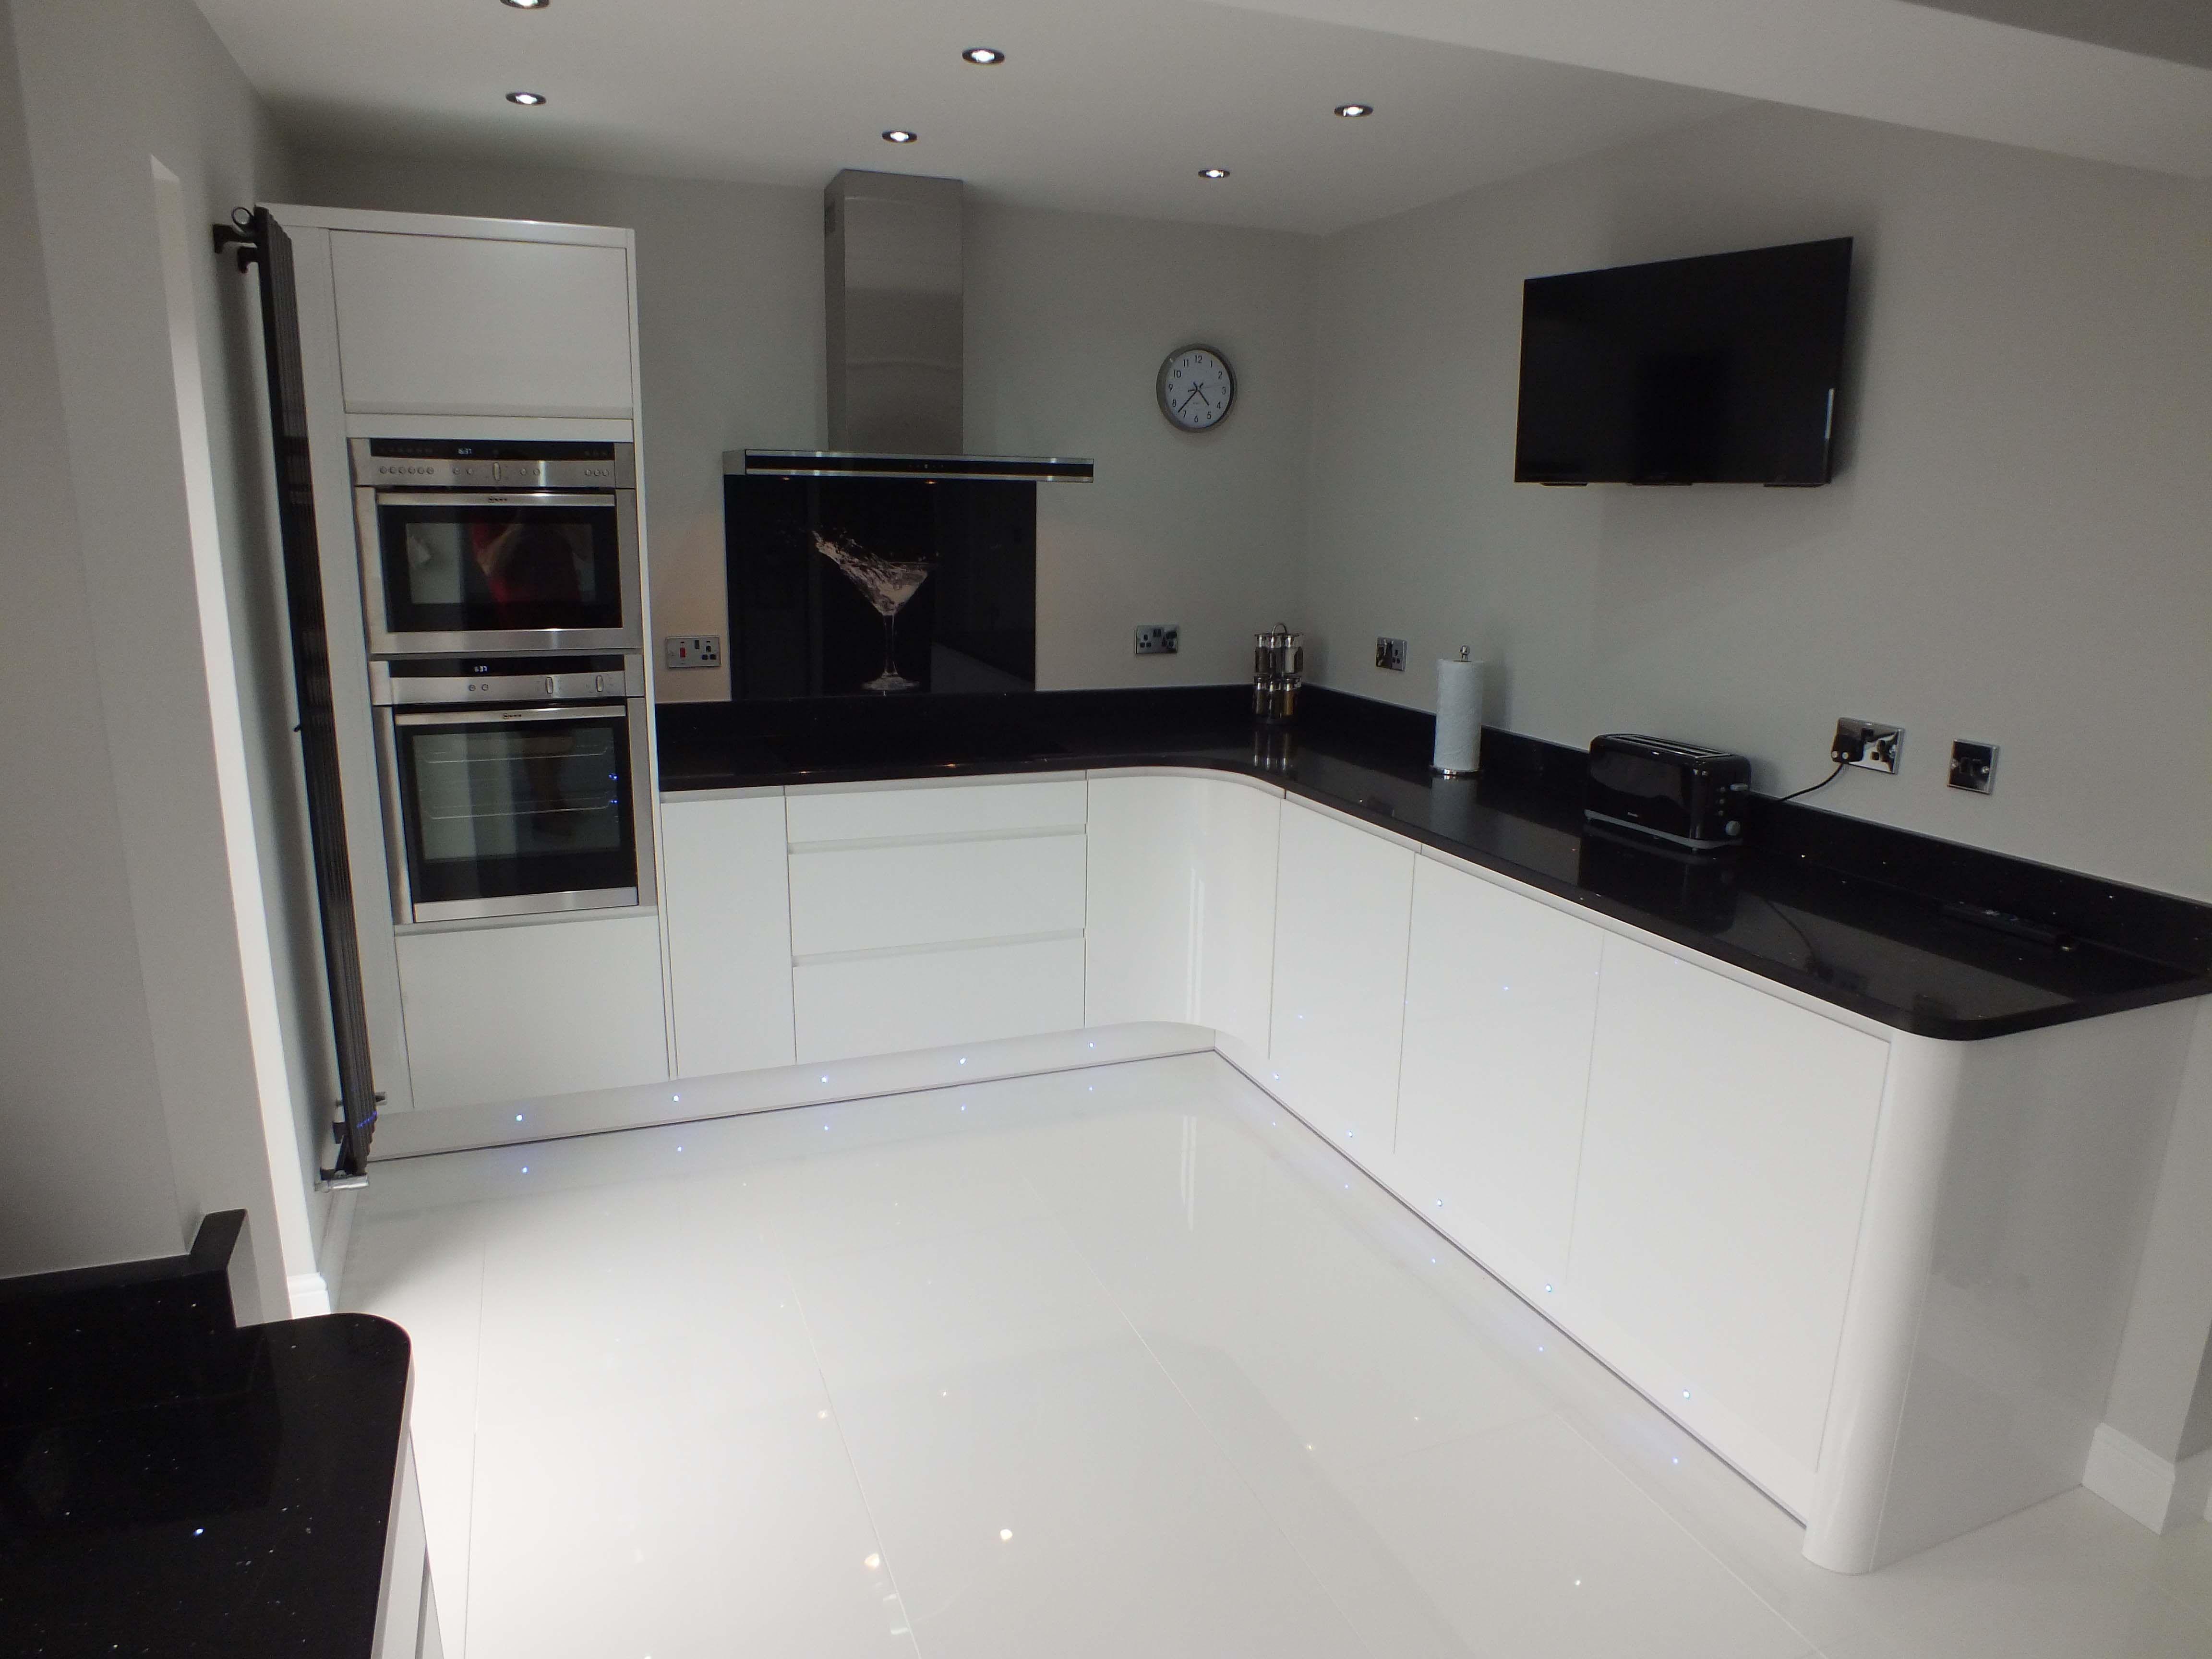 white gloss kitchen white kitchen designs This monochrome kitchen is ultra sleek with Handleless White Gloss units and black worktops The